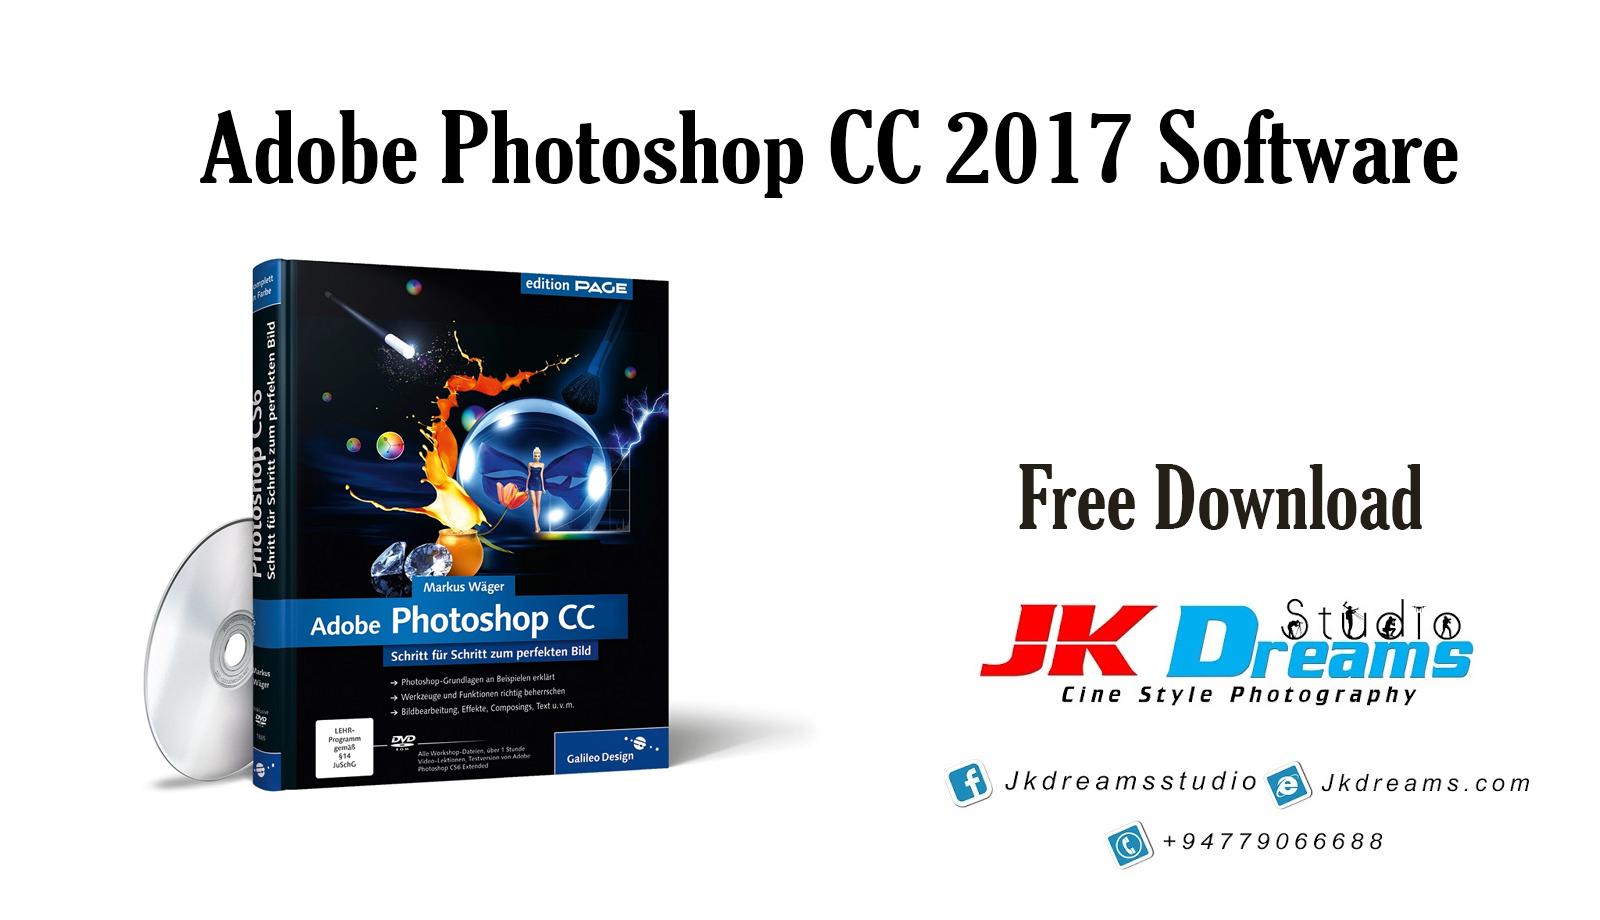 Adobe Photoshop CC 2017 Software Free Download | JK Studio - JK